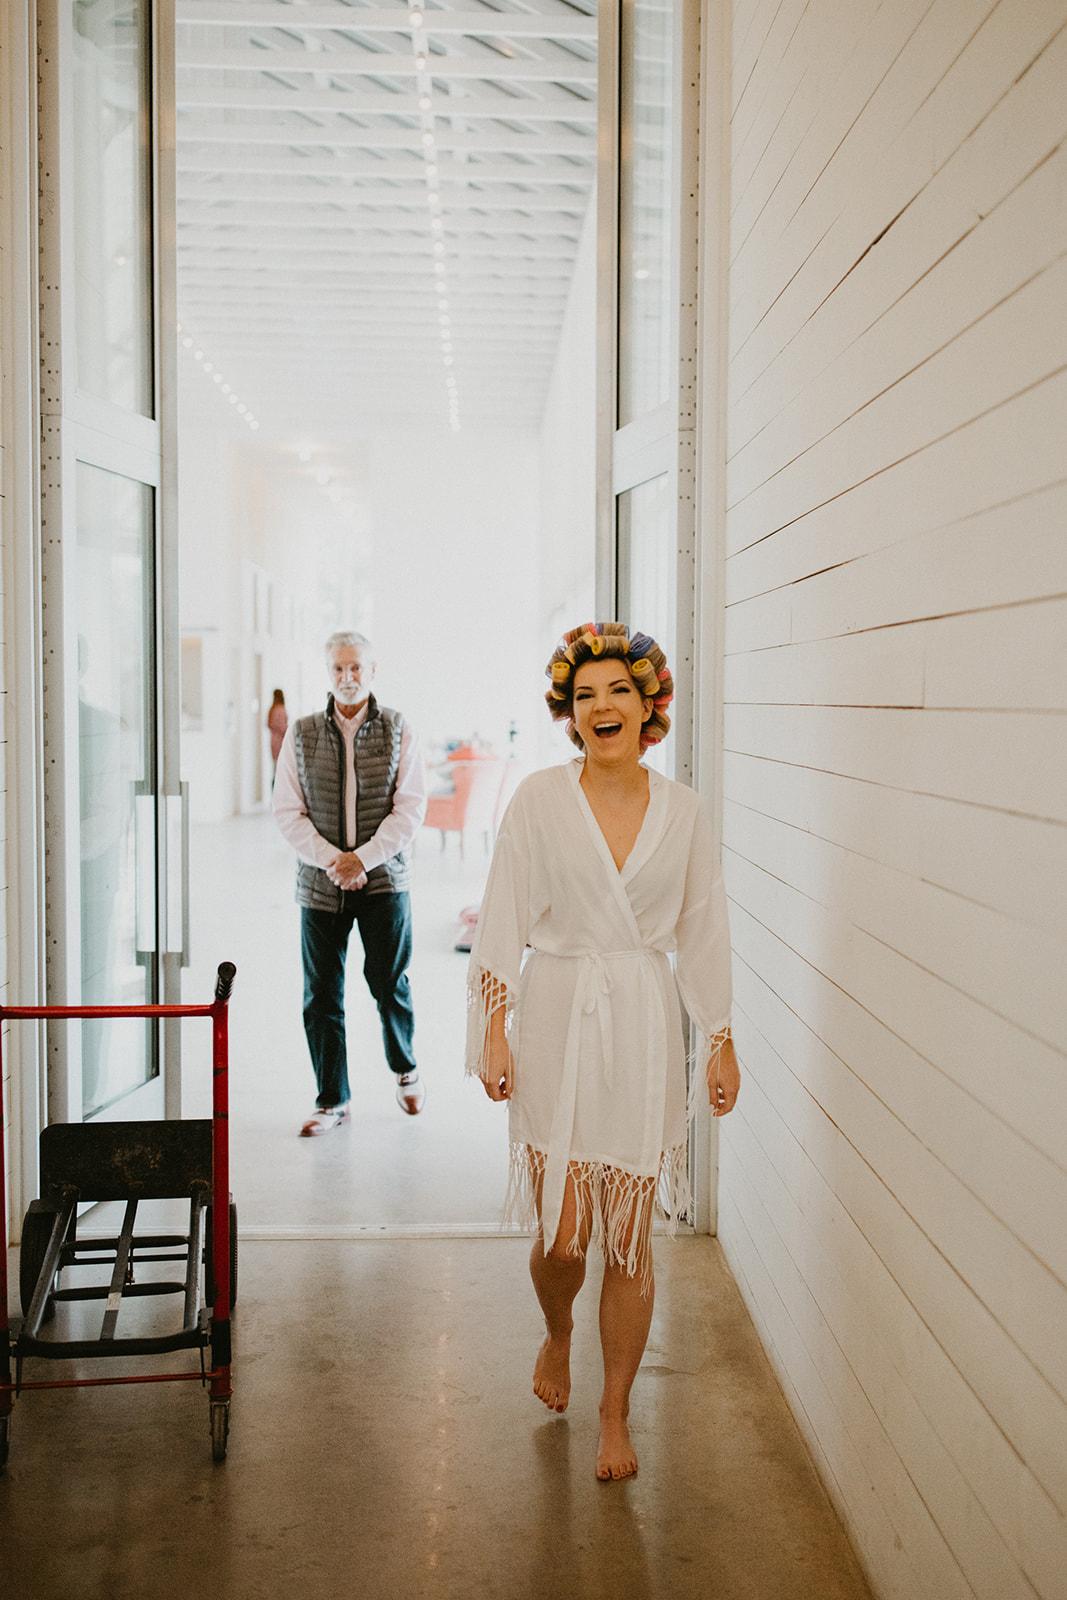 Bride Getting Ready Images + Bride Getting Ready Robe + Telluride Colorado Wedding Photographer Century Tree + Durango